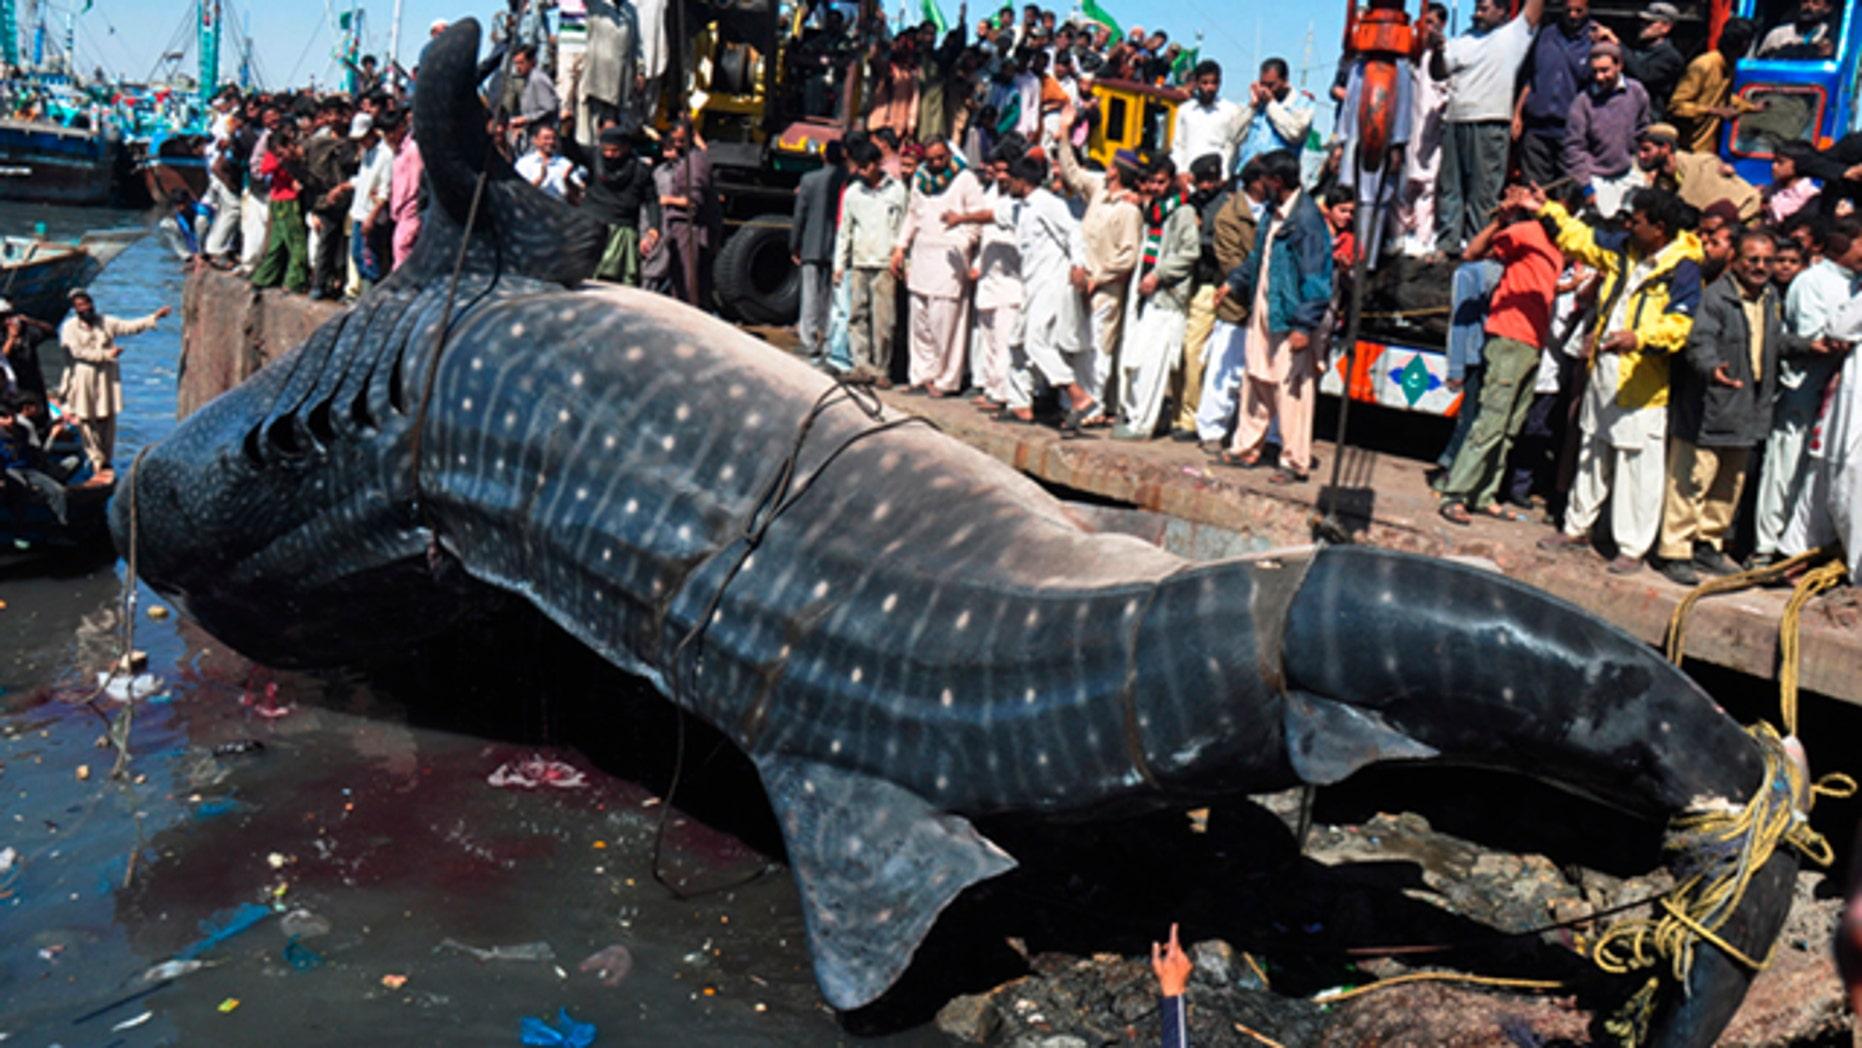 Feb. 7, 2012 People look at a carcass of whale shark in Karachi, Pakistan. The 40-foot whale was found dead near Karachi in the Arabian Sea